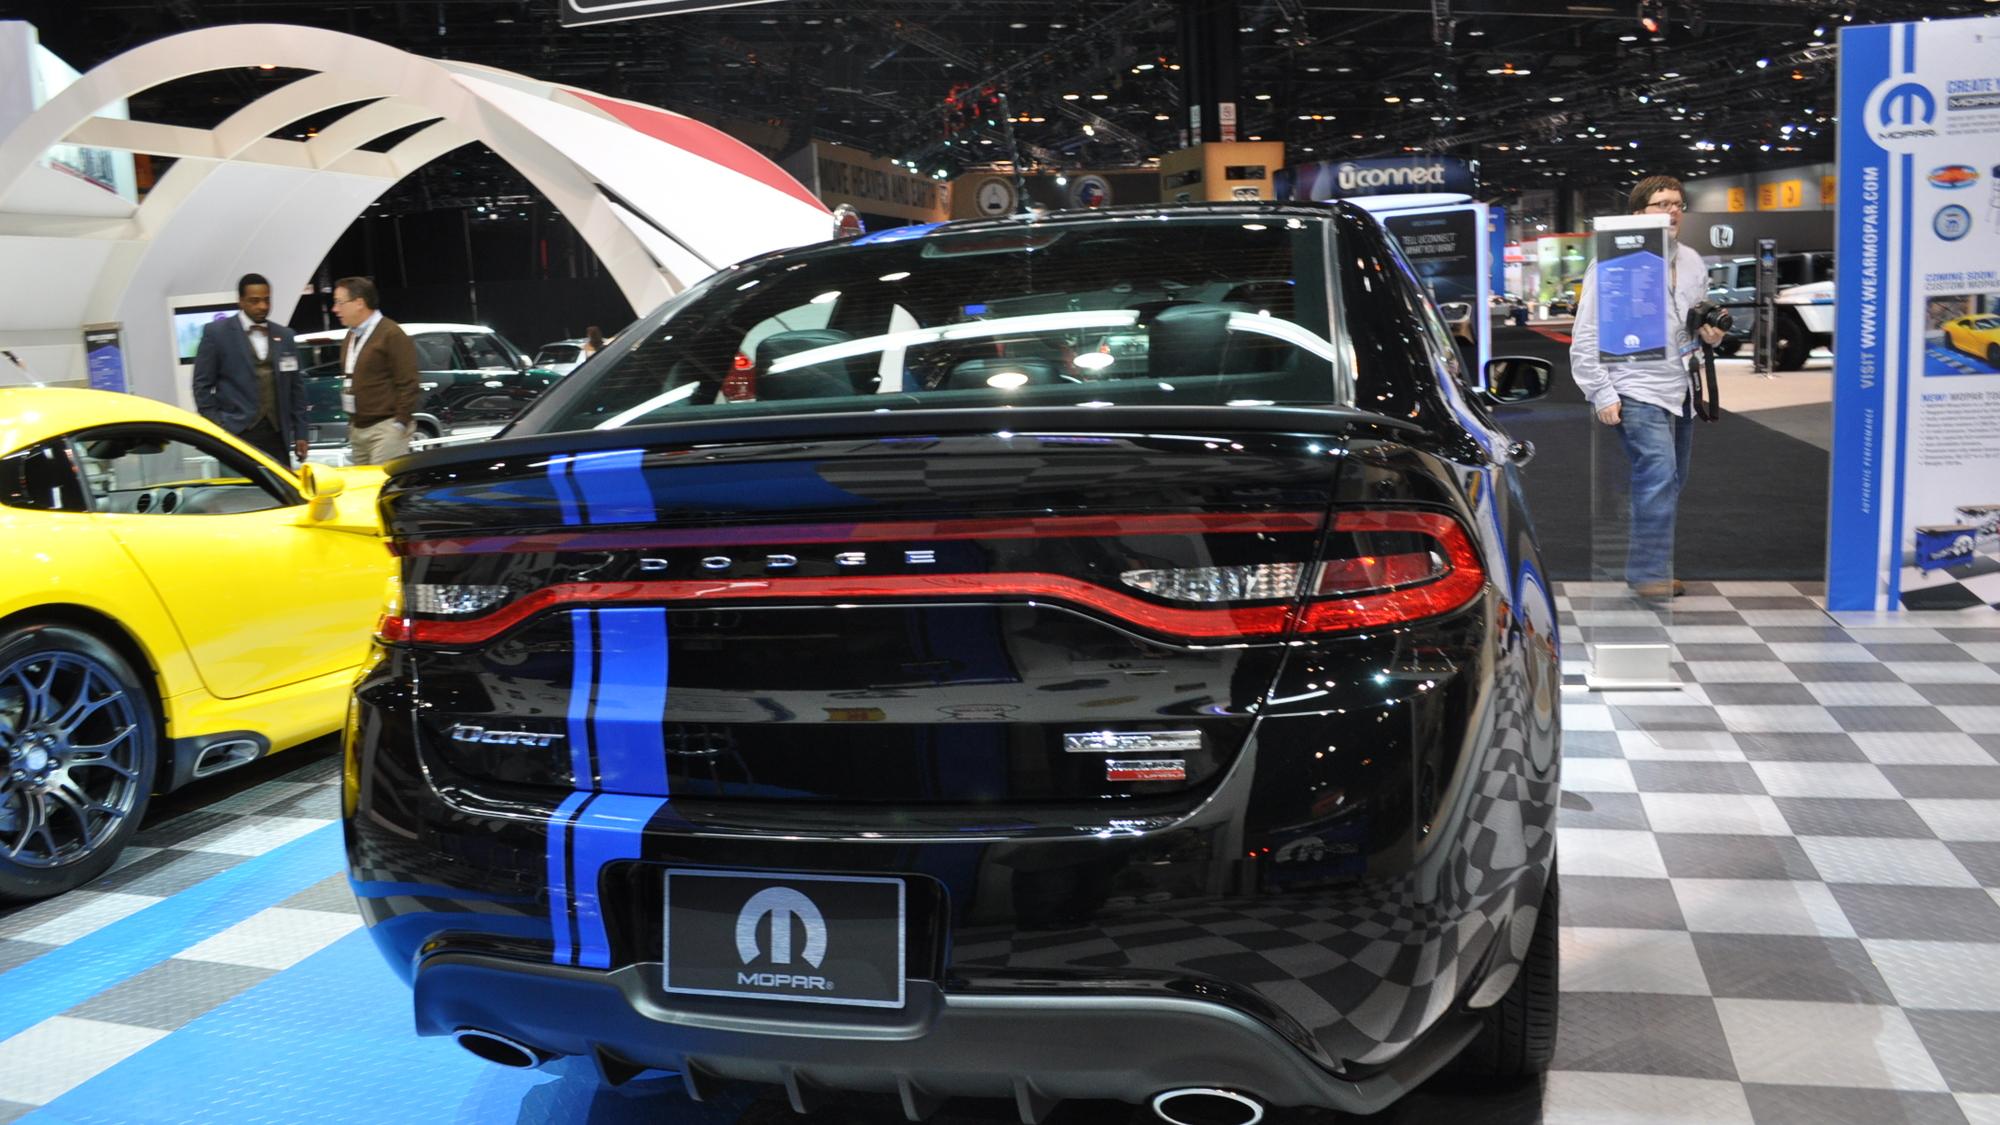 Limited Edition Mopar 13 Dodge Dart Debuts In Chicago